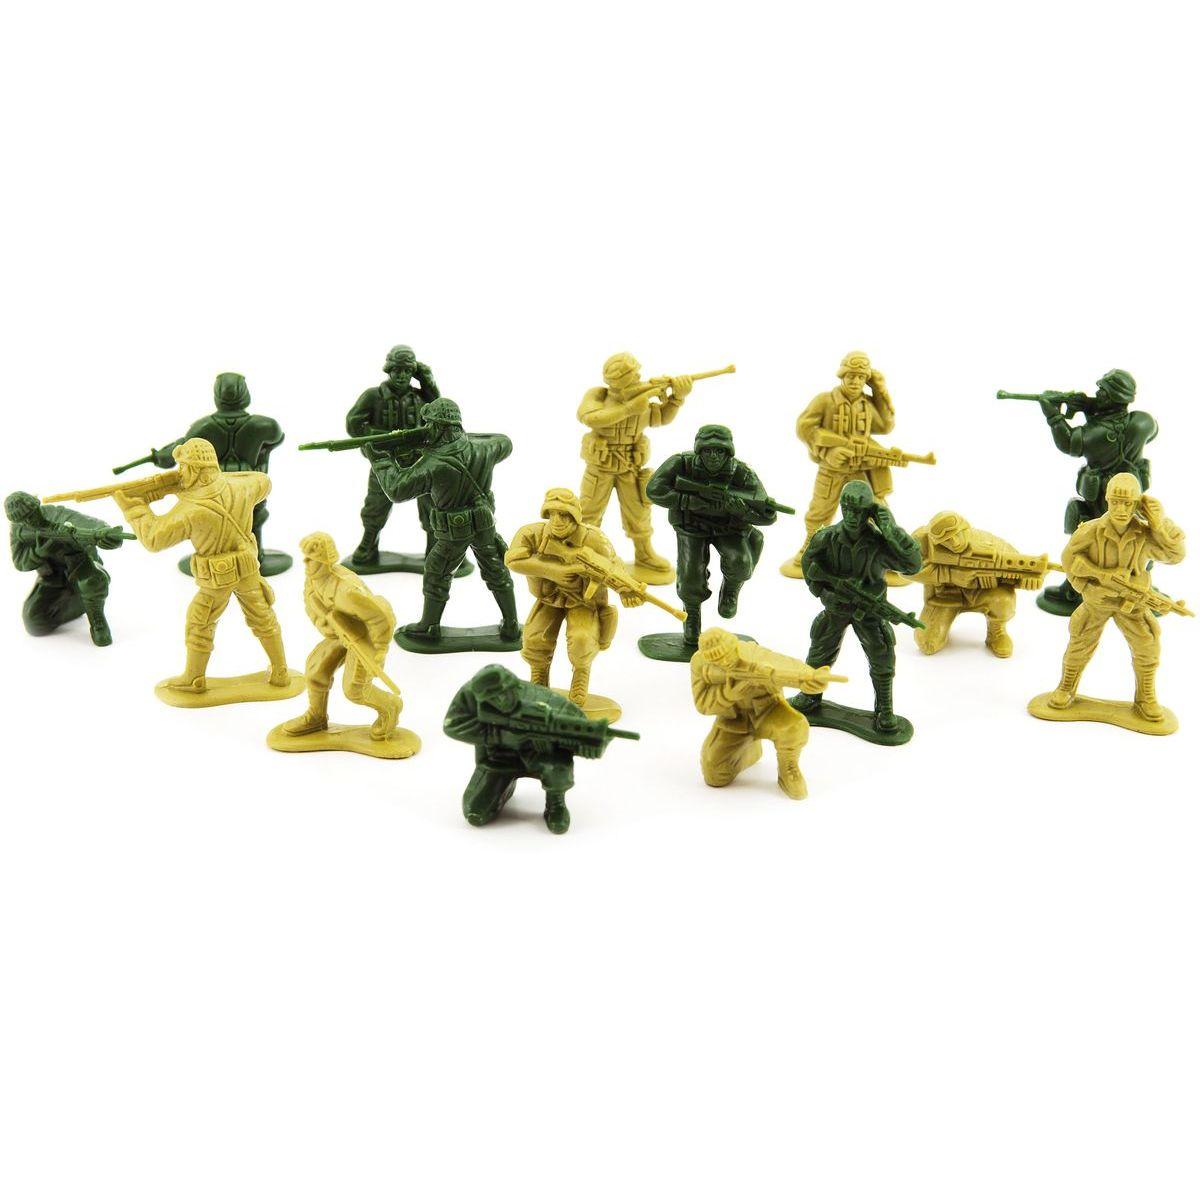 Sada vojaci 2 farby plast CZ dizajn